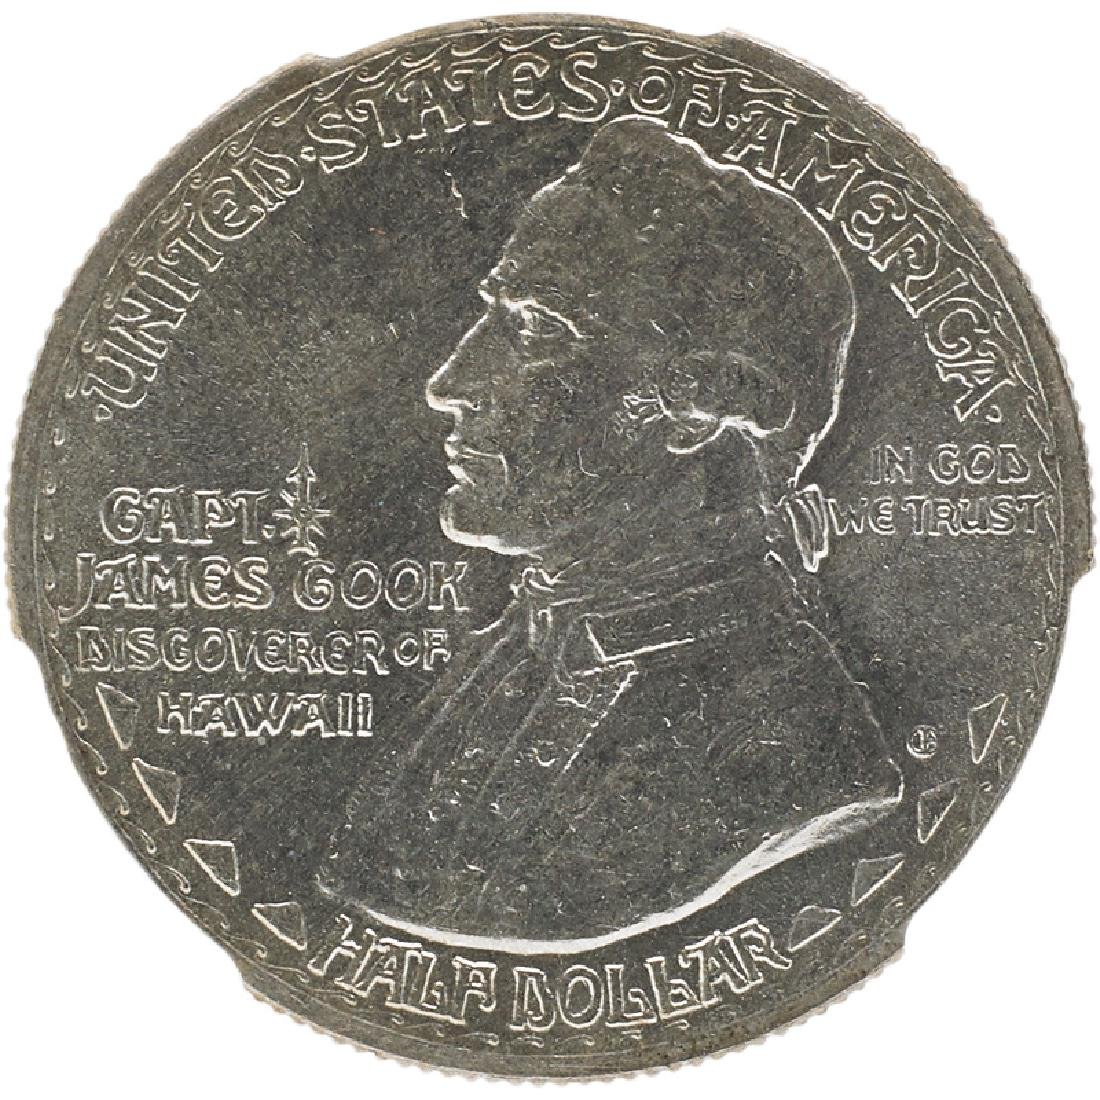 U.S.  1928 HAWAIIAN COMMEMORATIVE 50C COIN